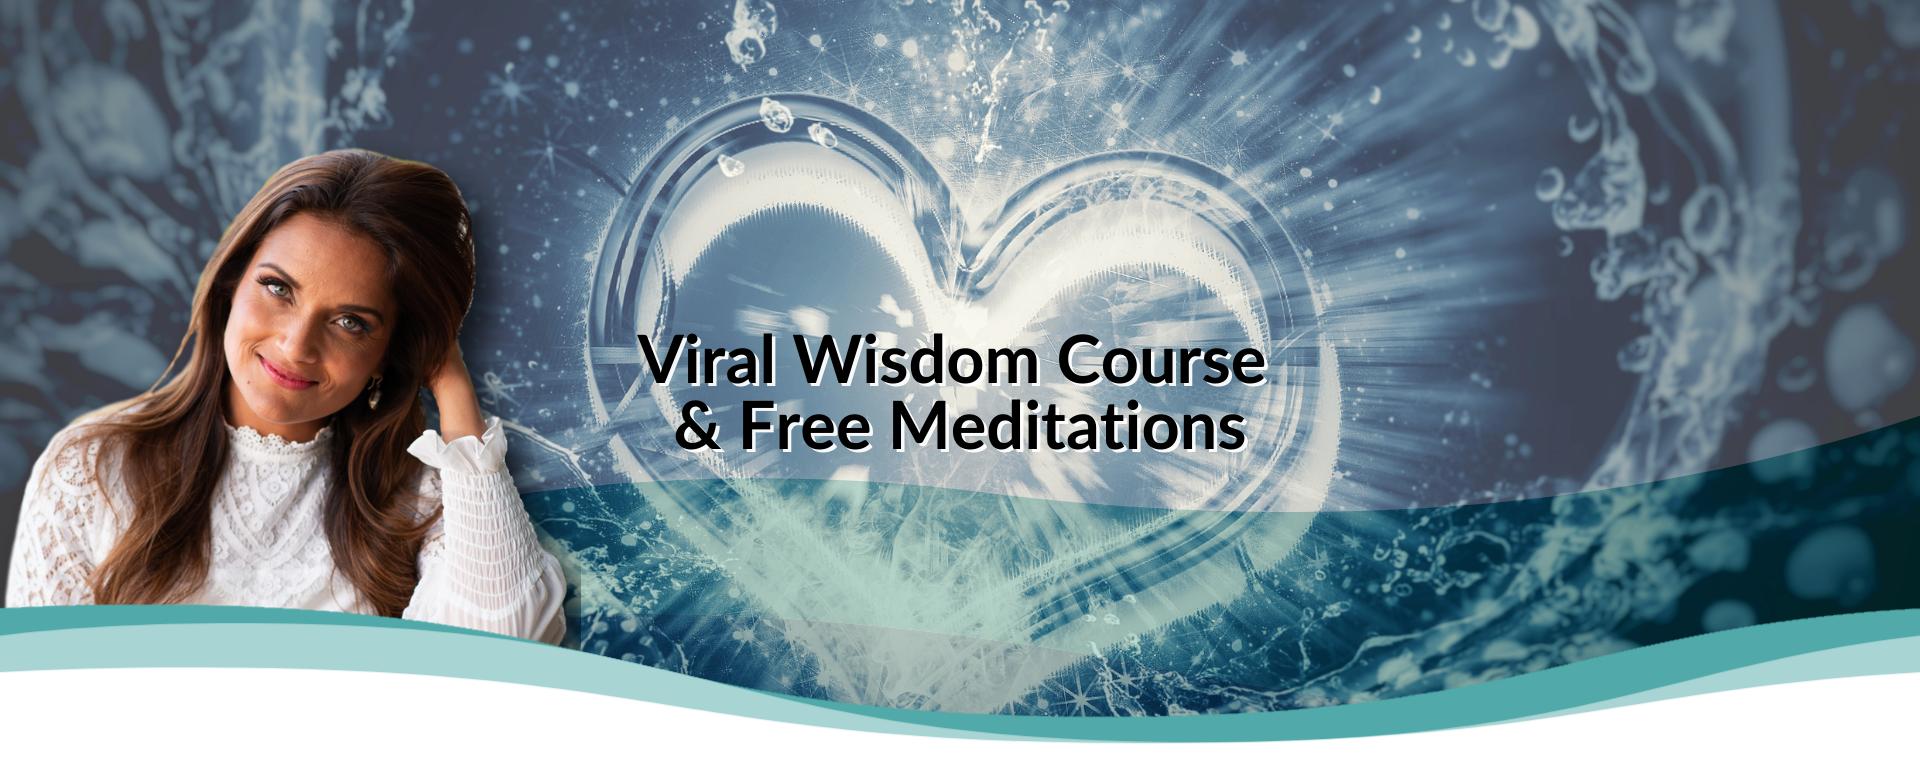 Viral Wisdom Course  & Free Meditations